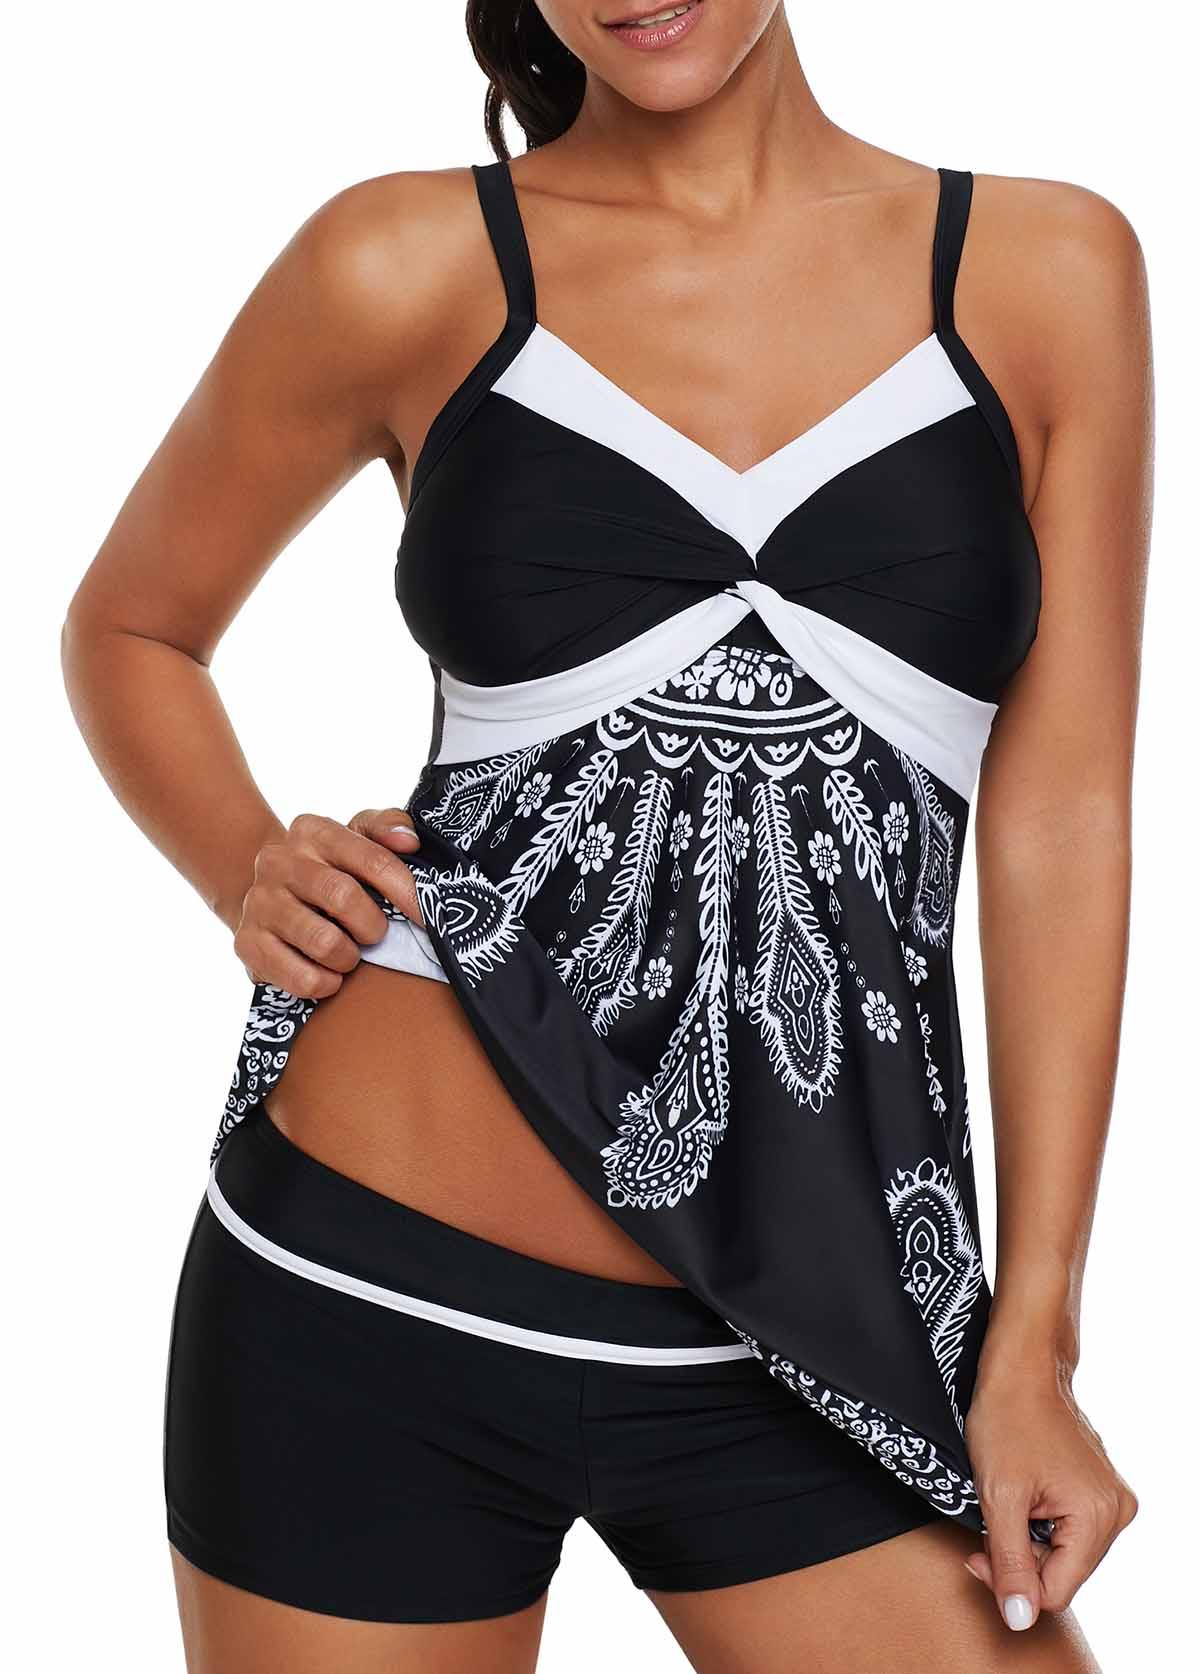 Spaghetti Strap Printed Black Swimdress and Shorts